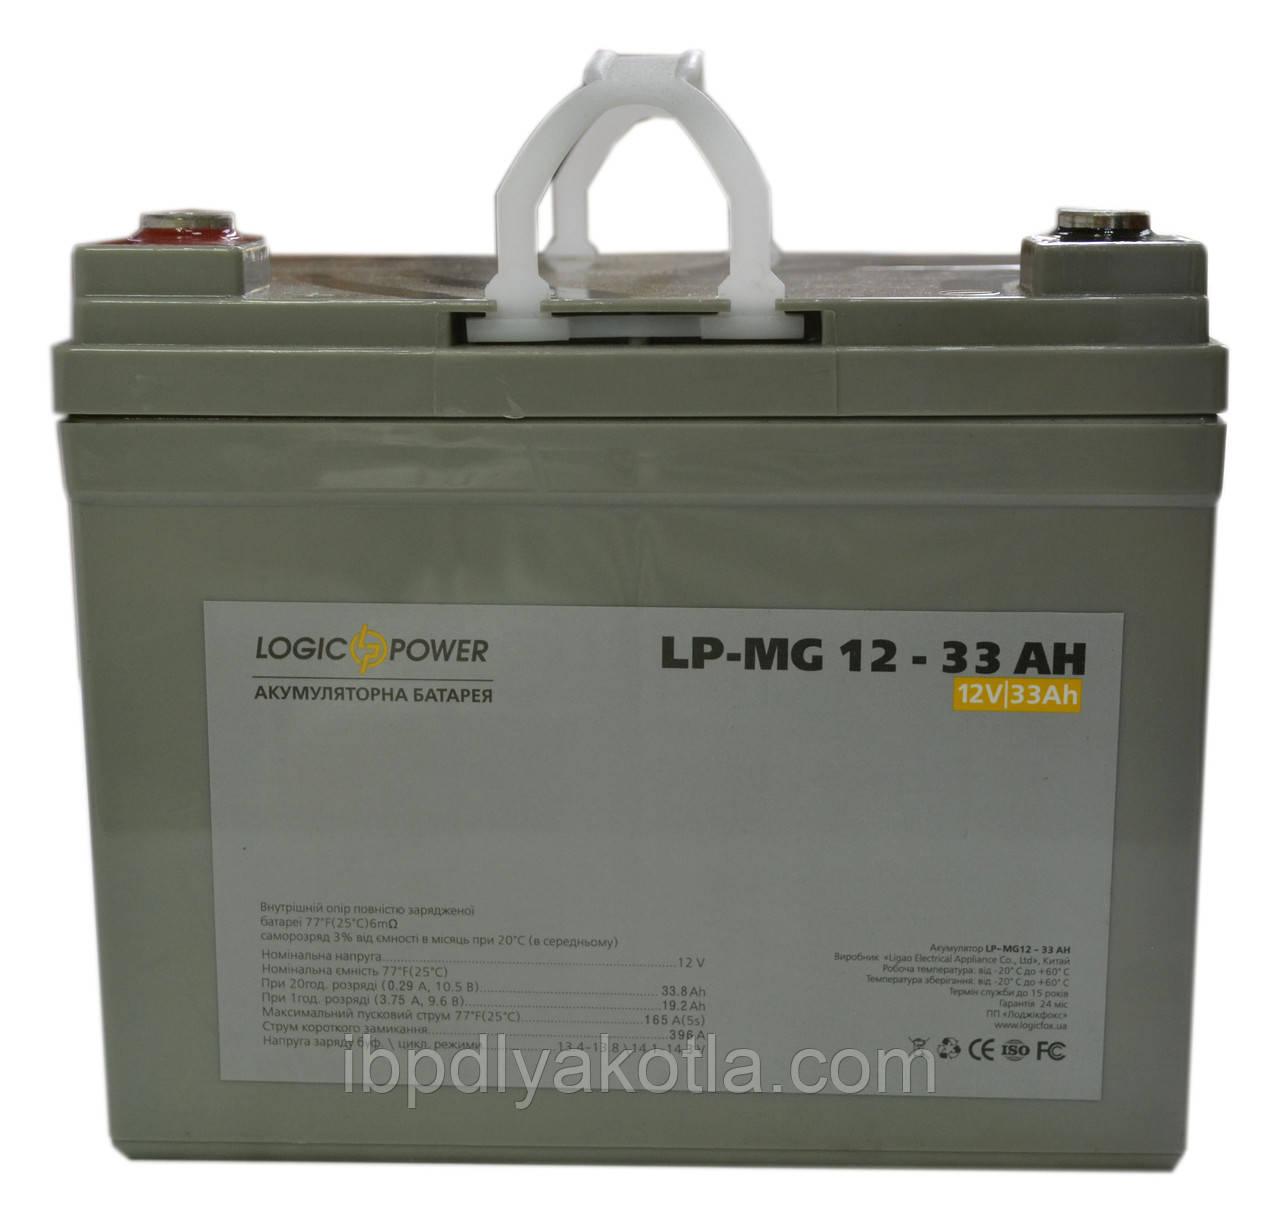 Logicpower LPM-MG 12V 33AH